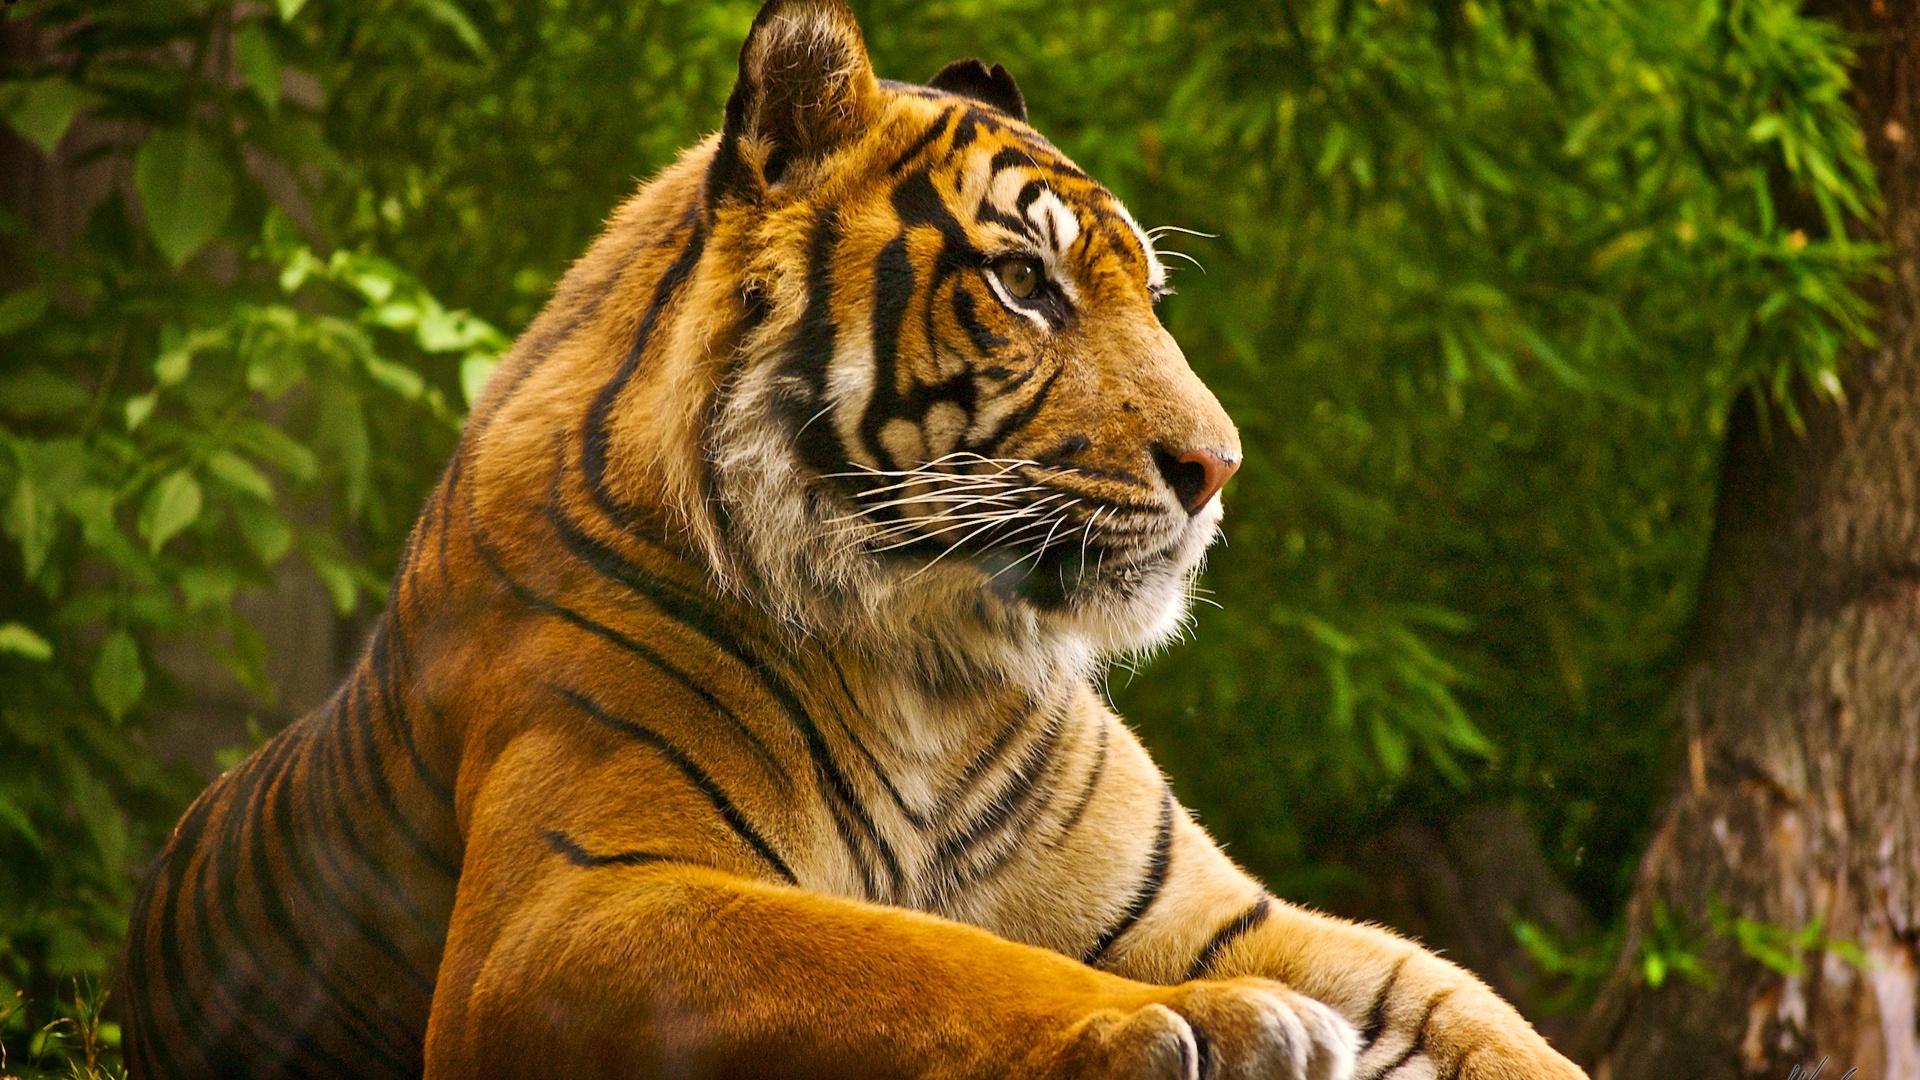 Clemson Tigers Desktop Wallpaper   wwwwallpapers in hdcom 1920x1080